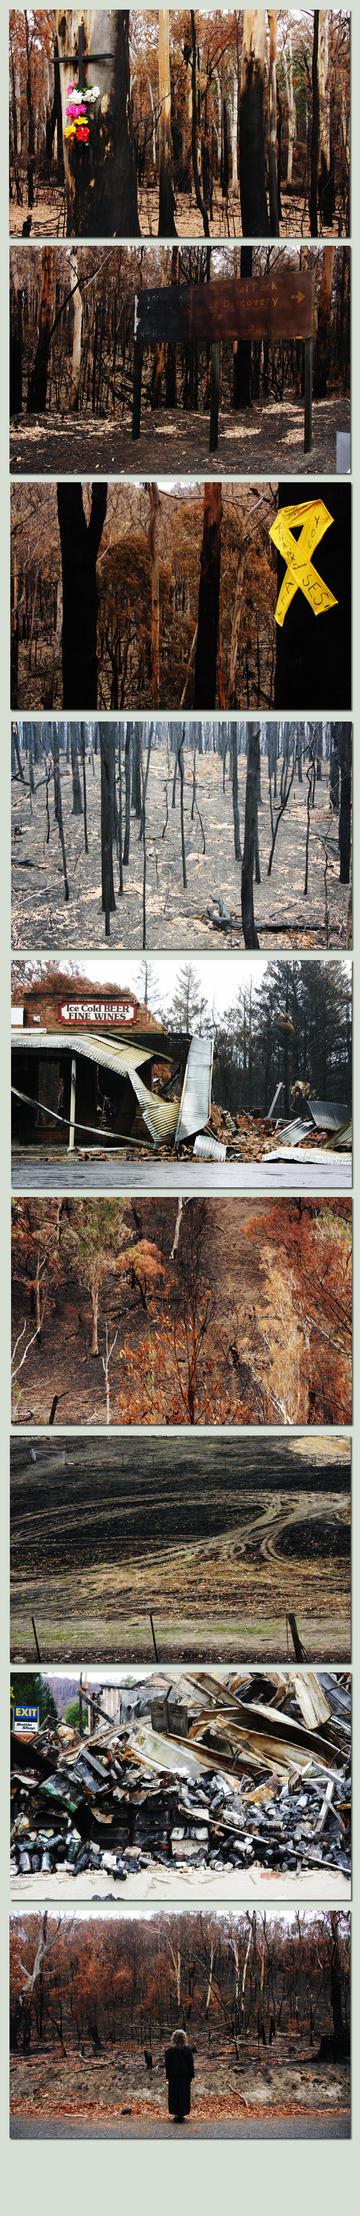 bushfire aftermath by Offering